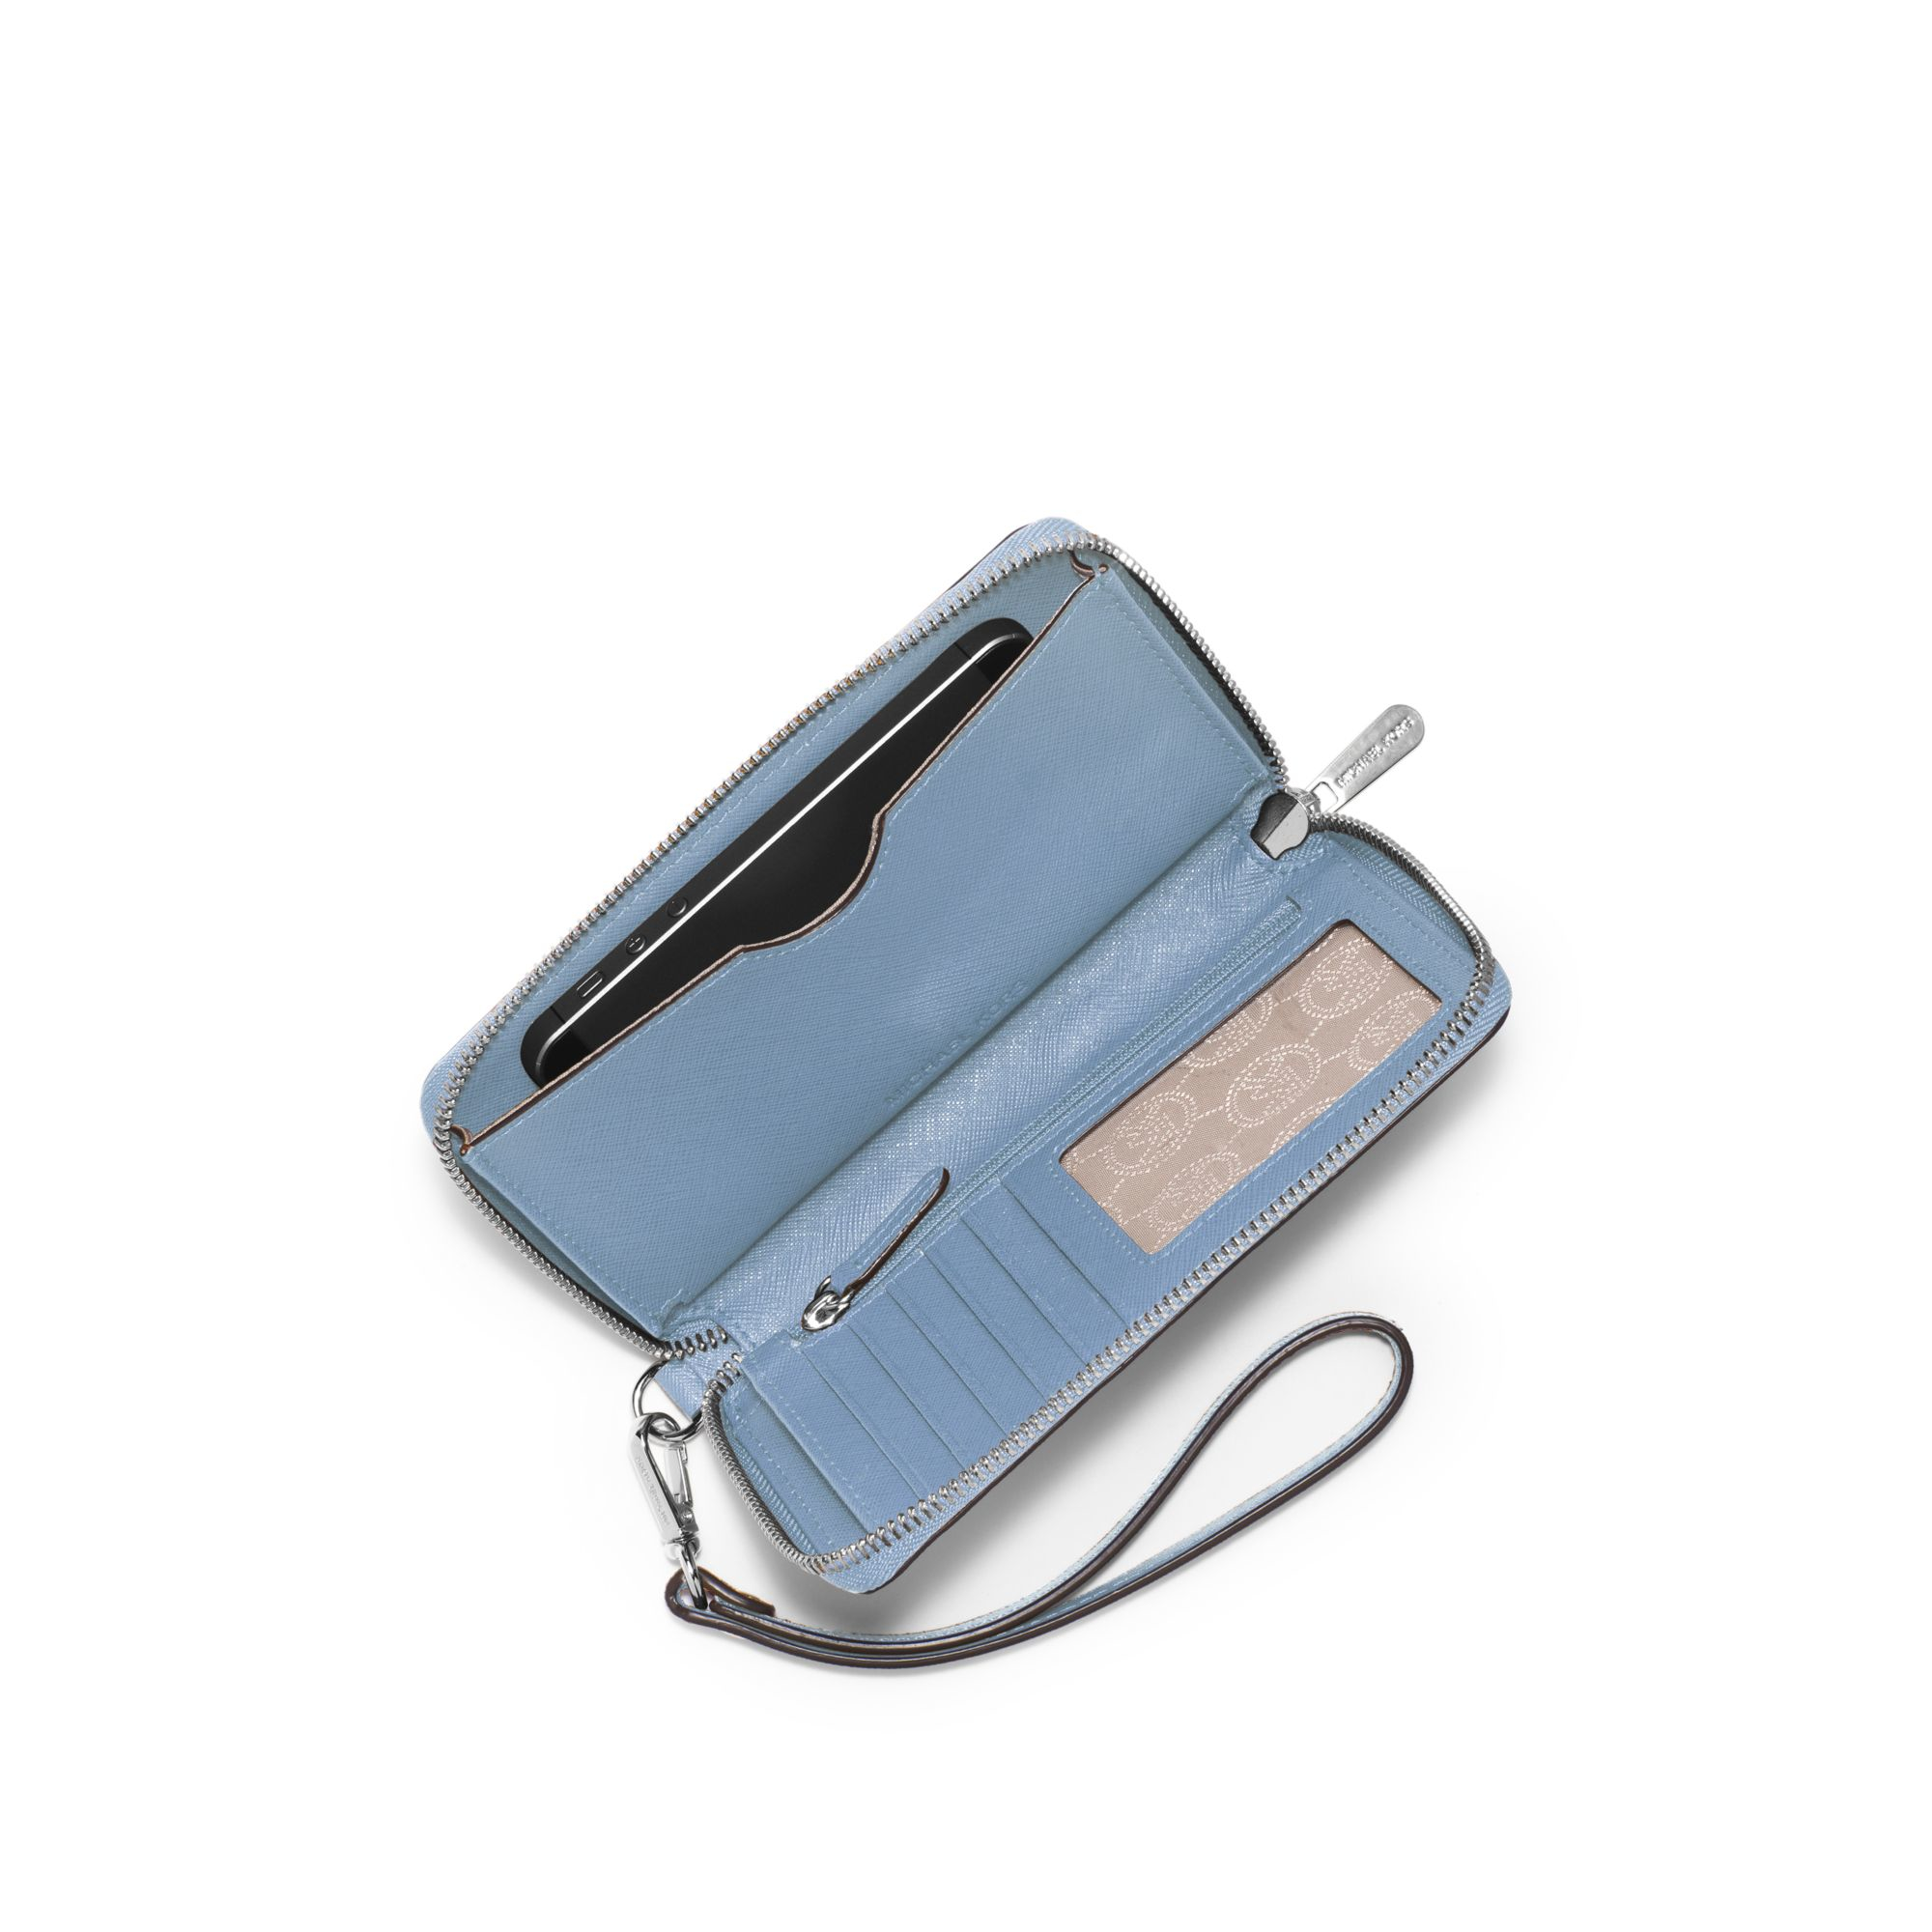 56f0de772795 Michael Kors Large Saffiano Leather Smartphone Wristlet in Blue - Lyst